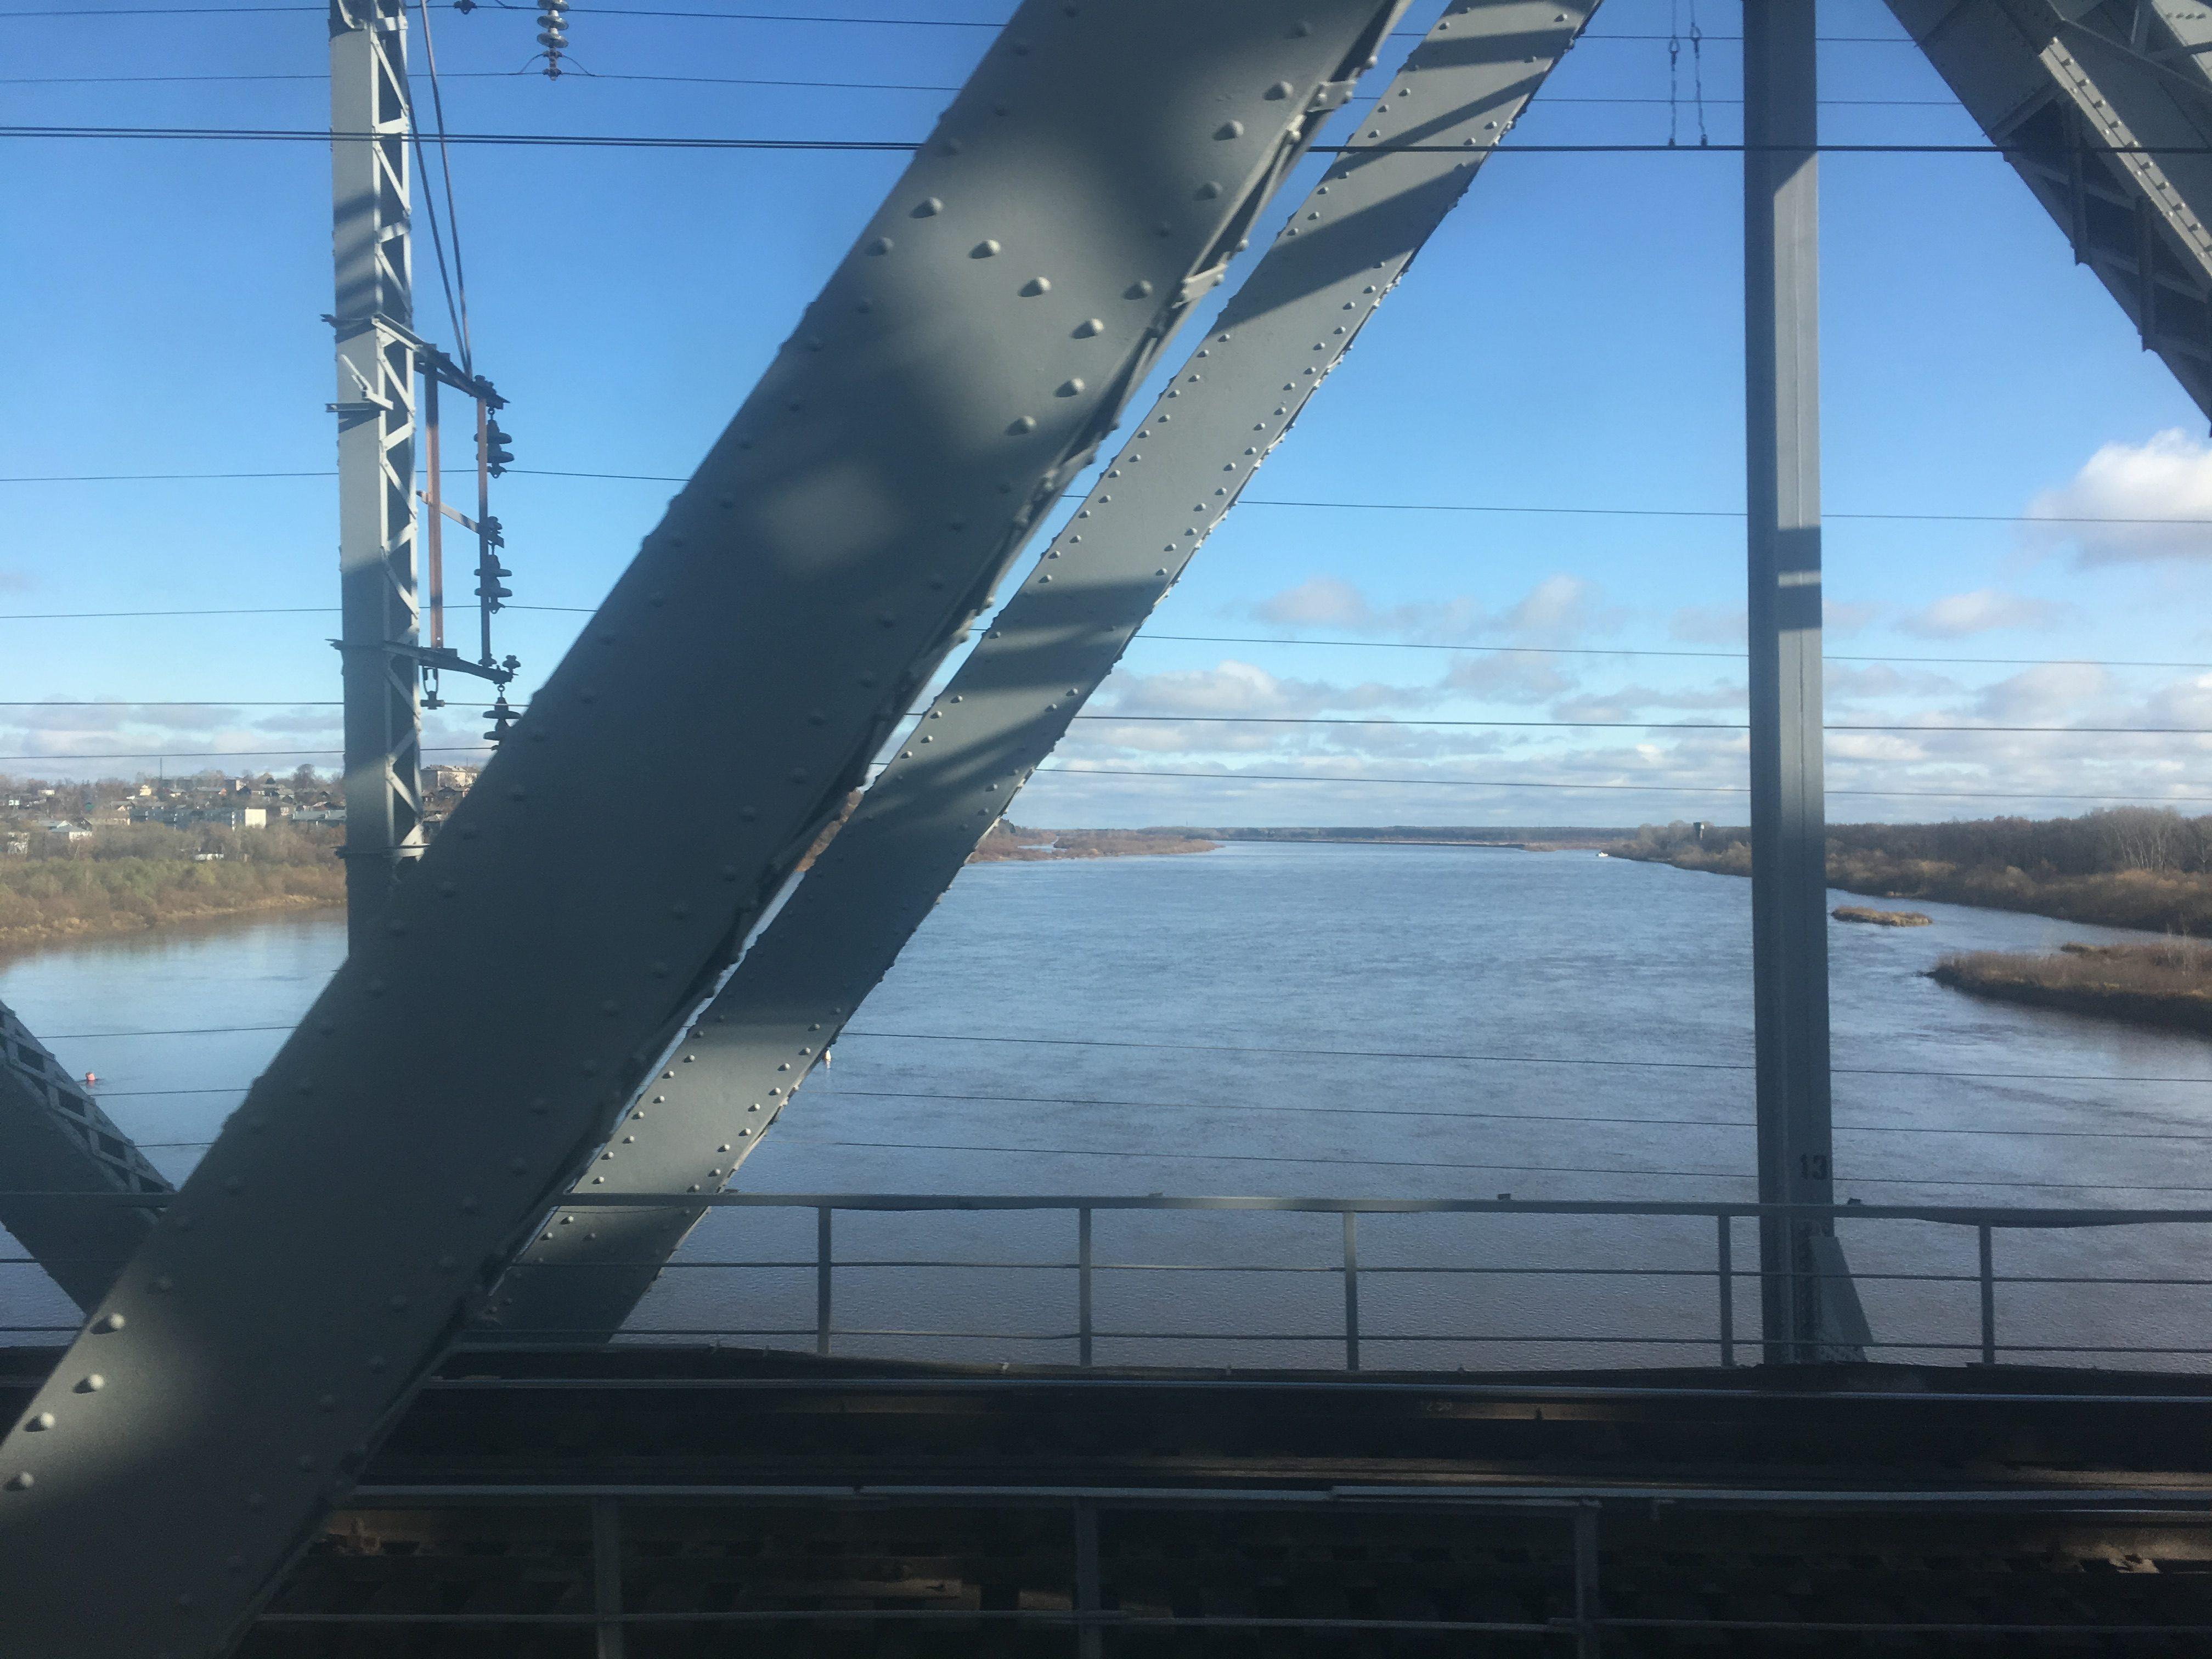 Kotelnich Bridge changed the sounds of the train wheels